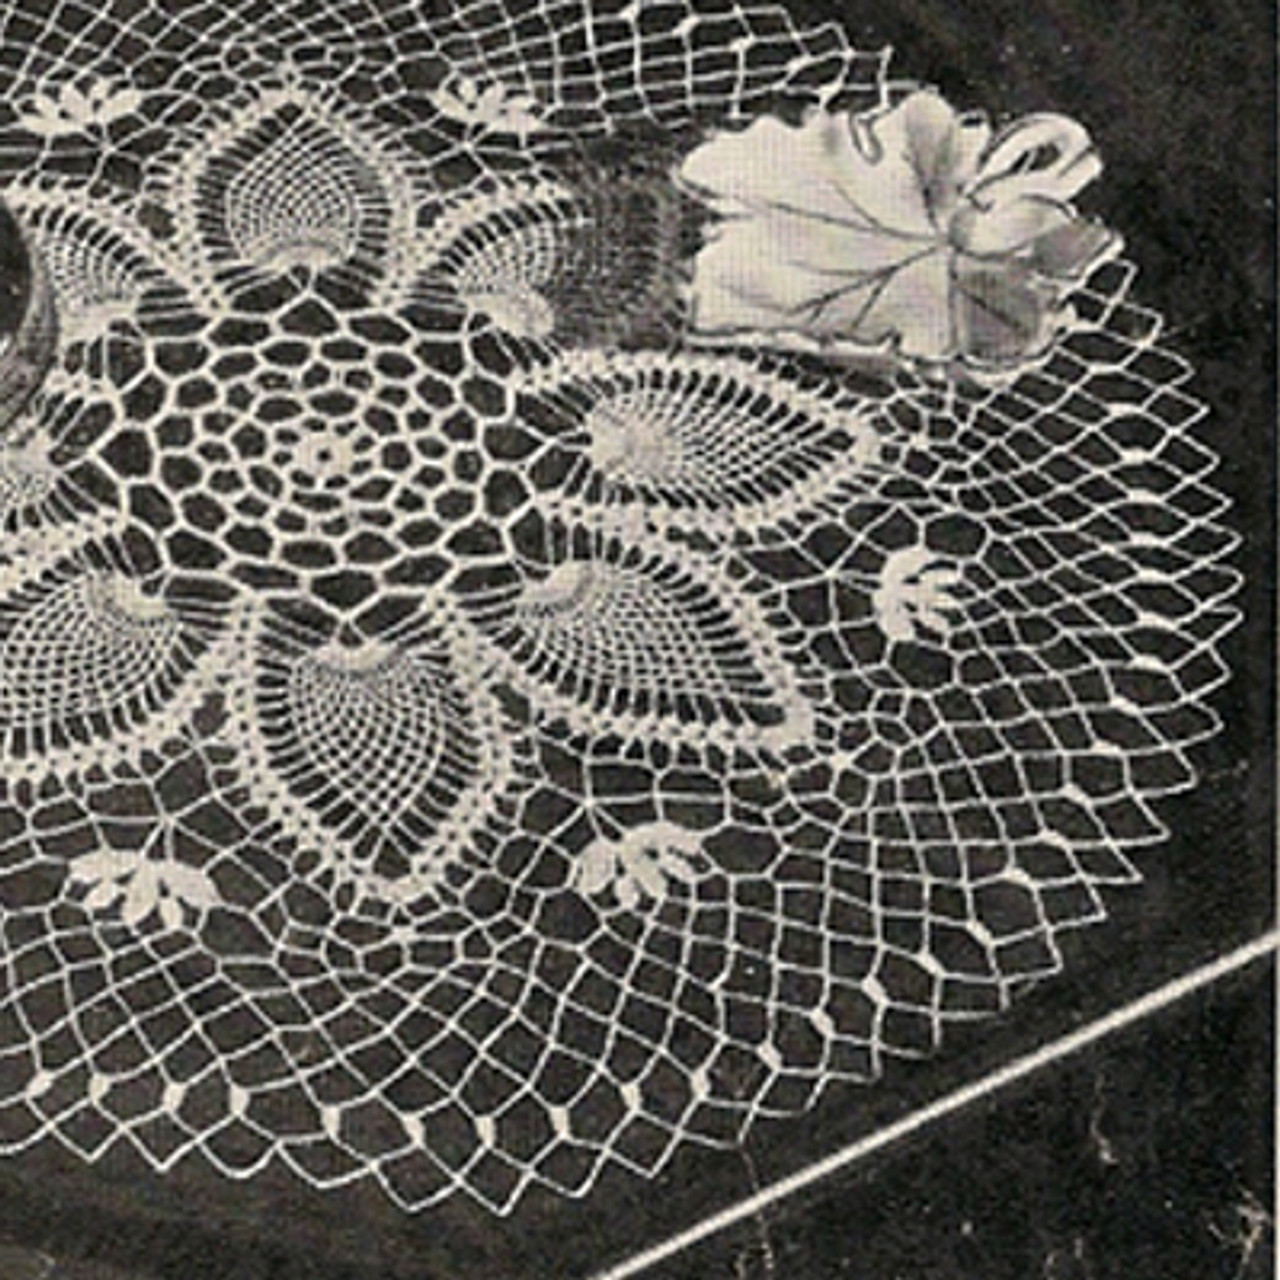 Crocheted Pineapple Flower Doily Pattern